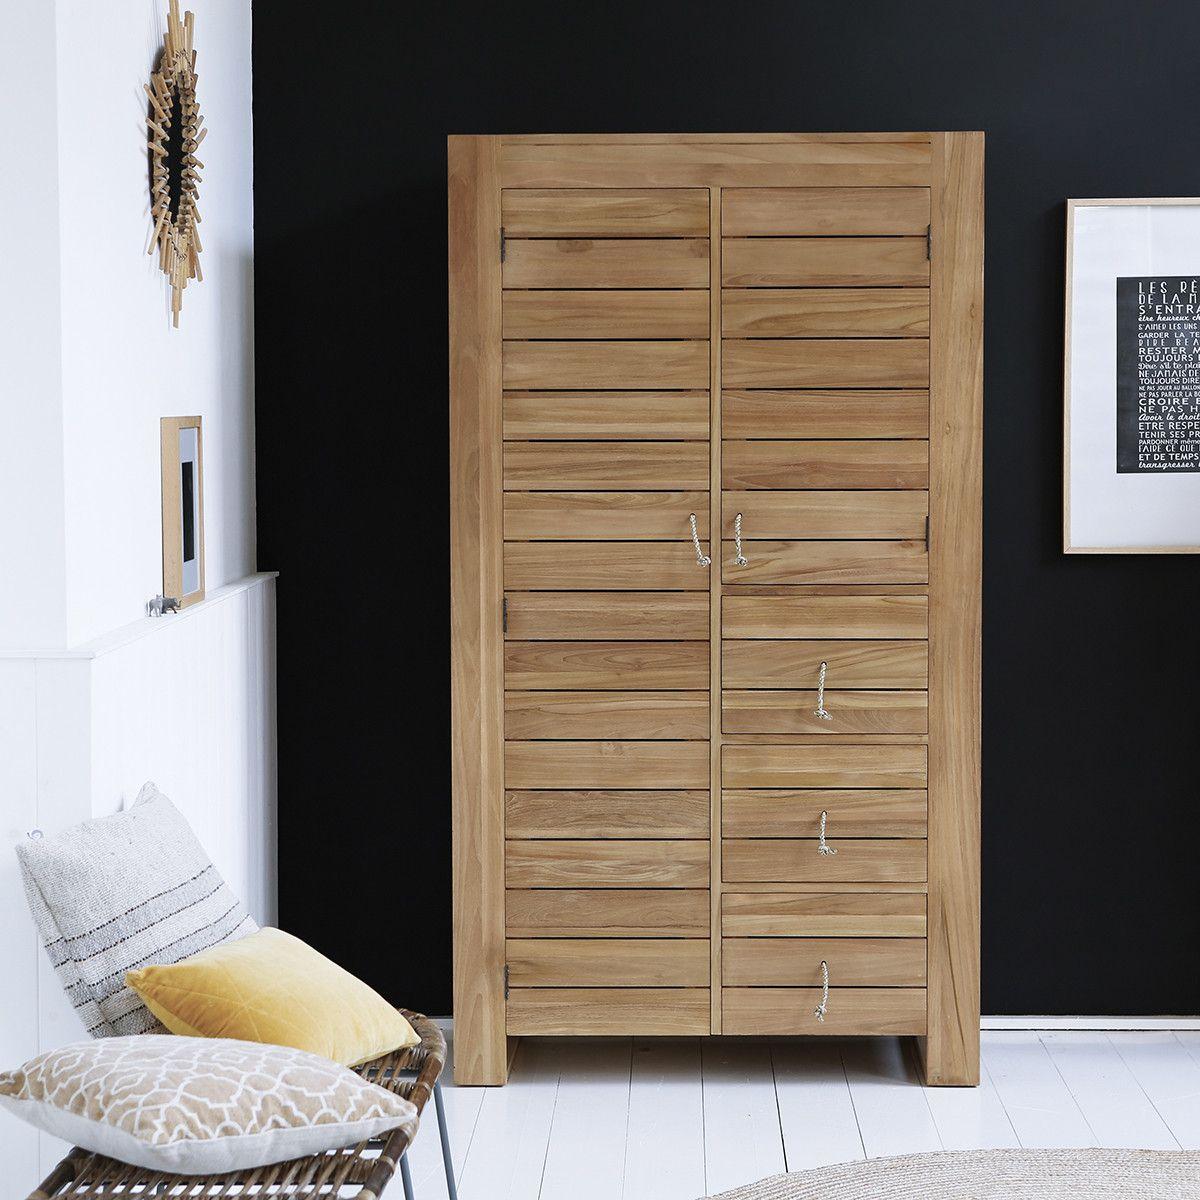 Solid Teak Double Wardrobe 2 Cupboards Natural Wood 180 Cm Bedroom